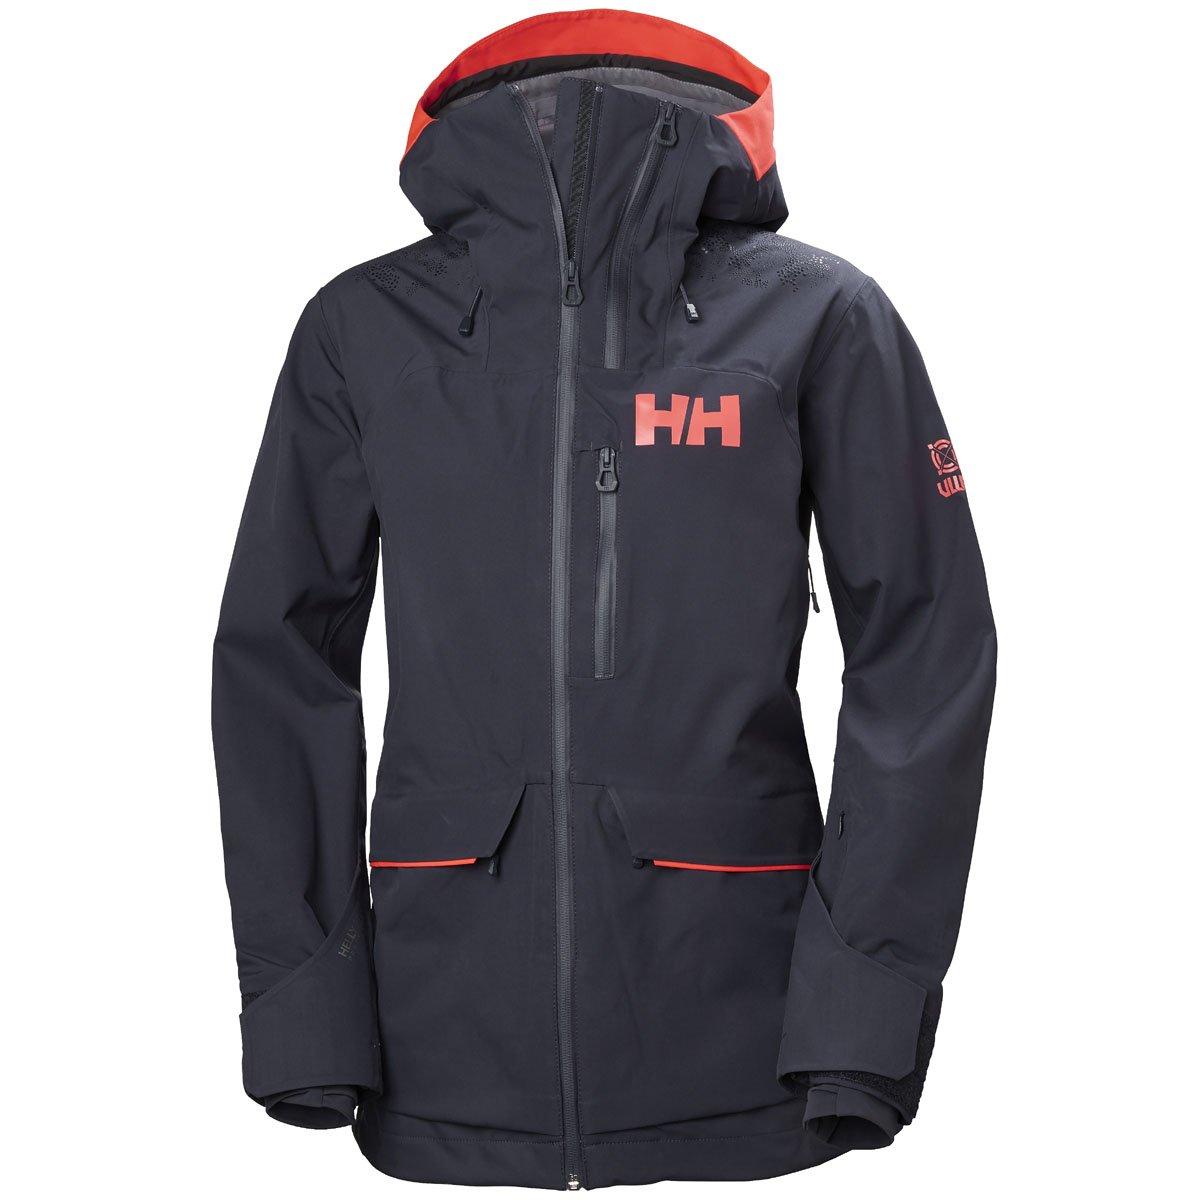 39ca317df3 Amazon.com  Helly Hansen Women s Aurora 2.0 Waterproof Shell Ski Jacket